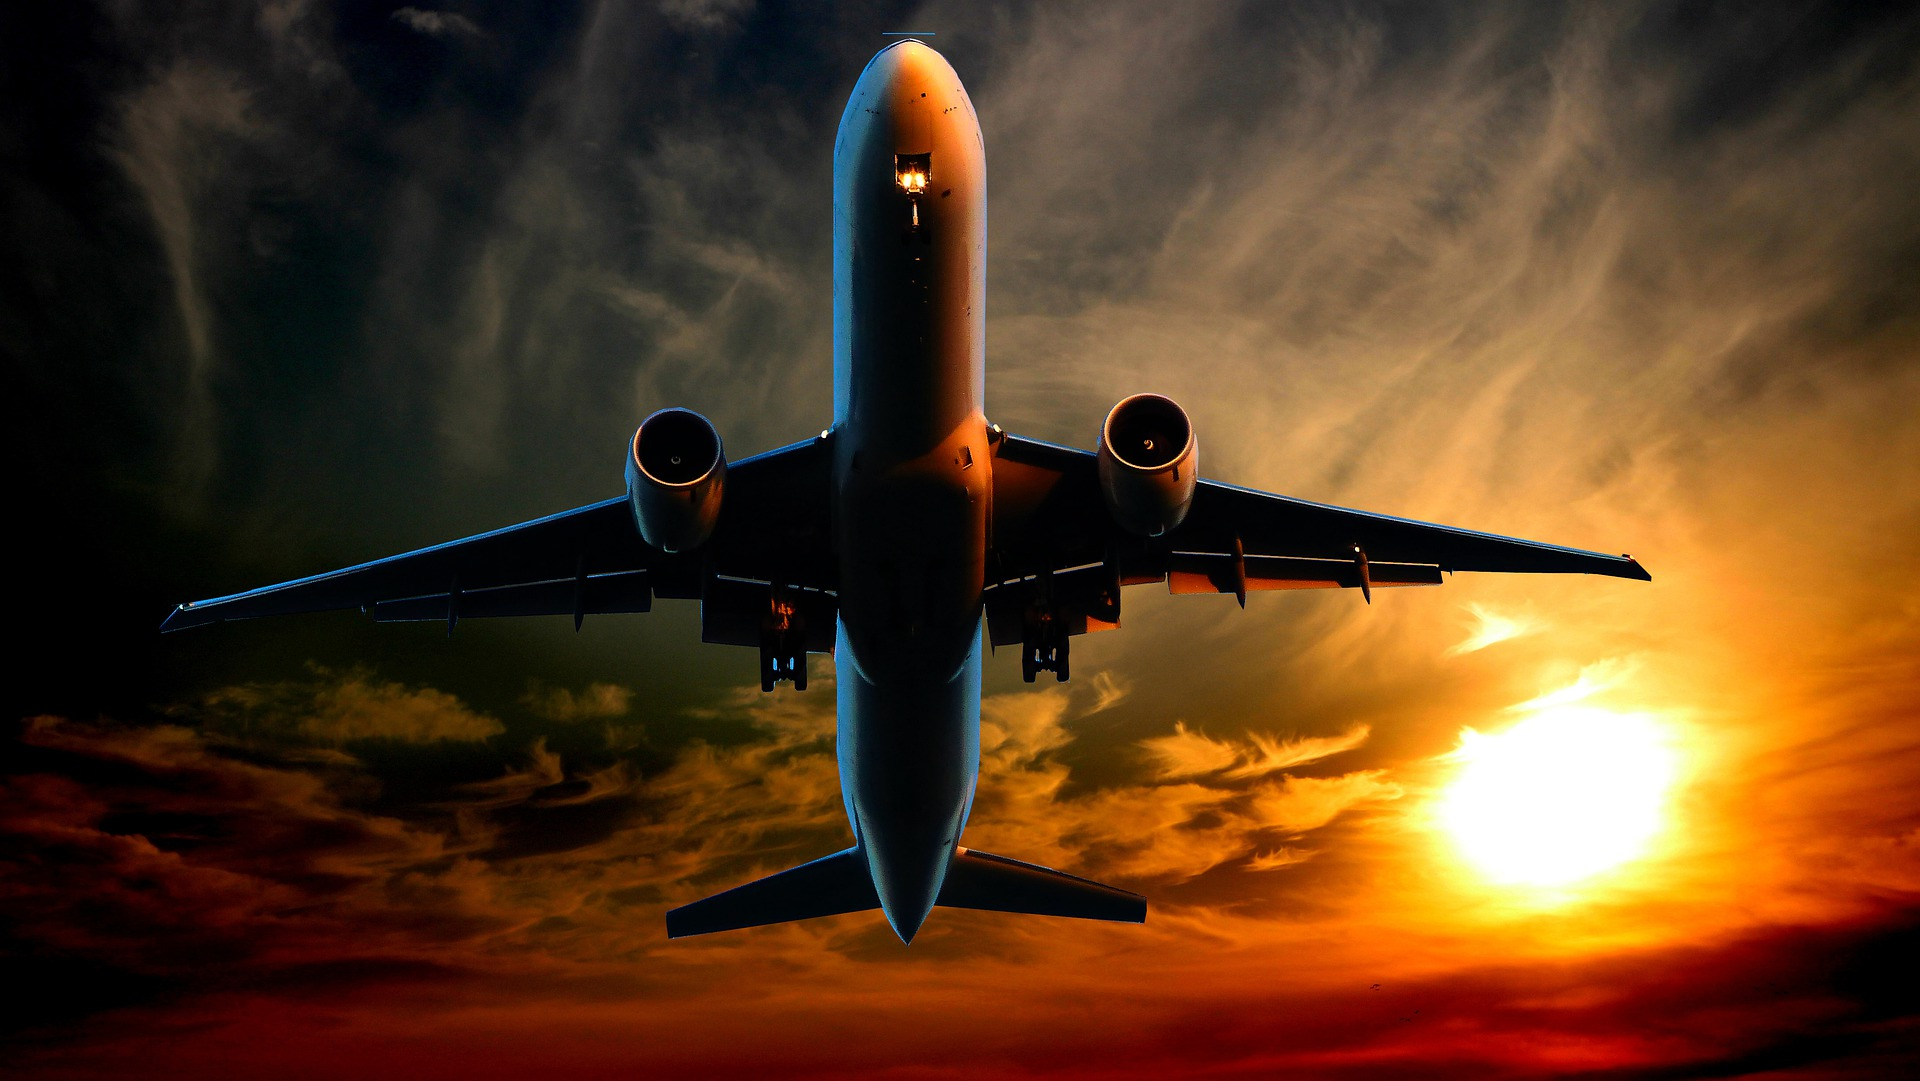 vuelos después de la pandemia-posdata digital press